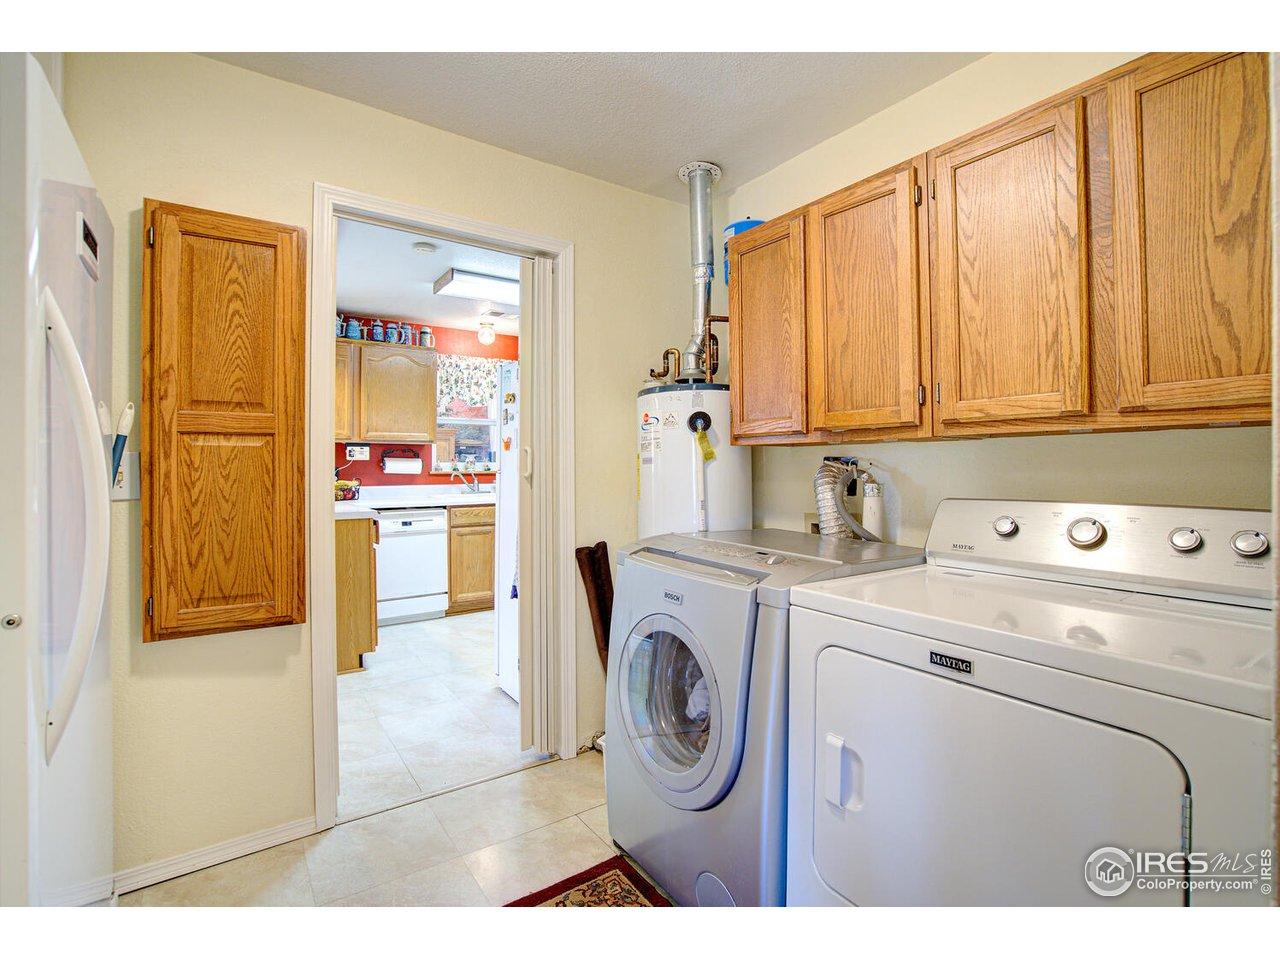 9 x 7 Laundry Room!